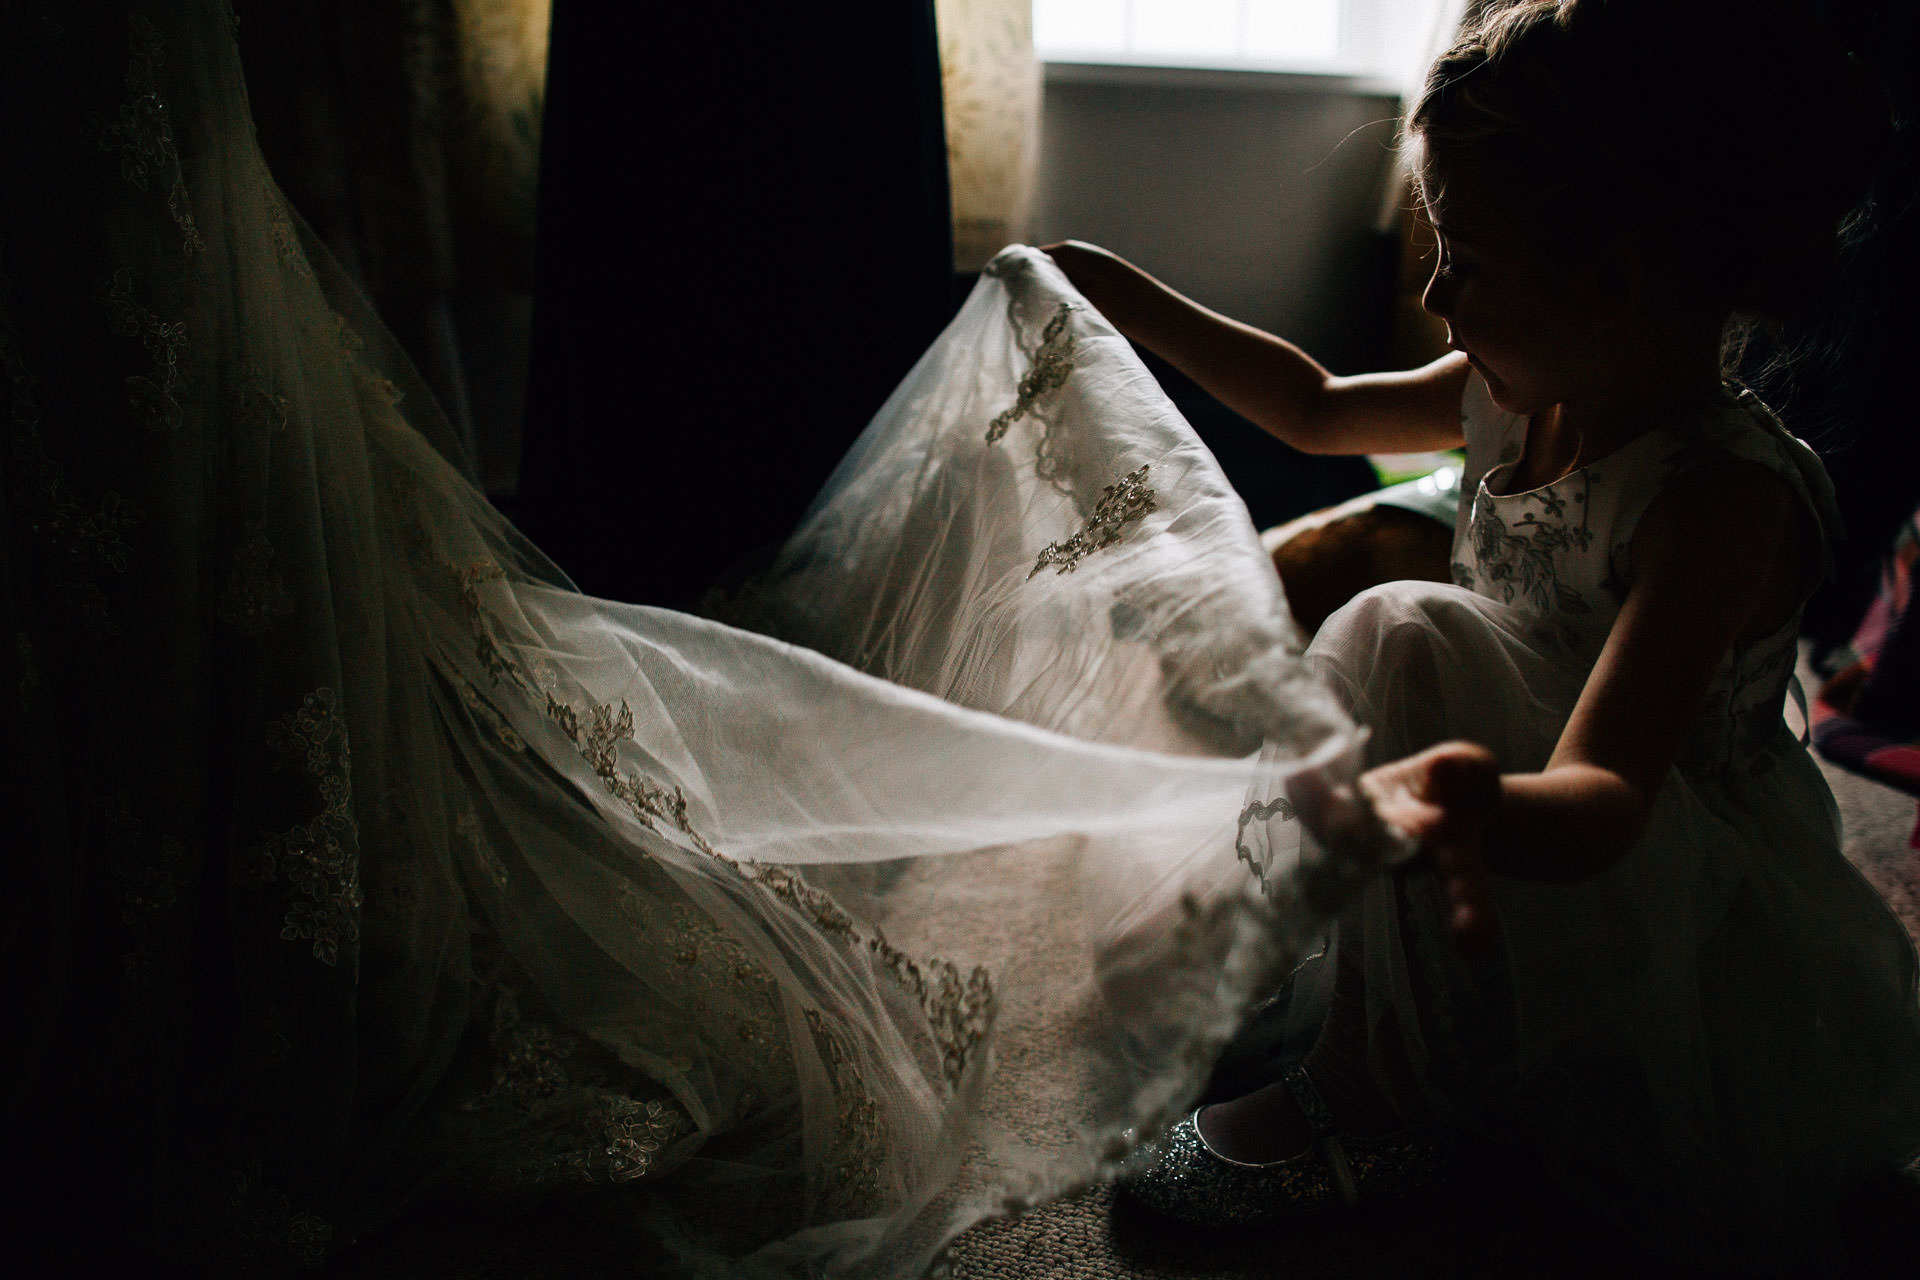 cheshire-rustic-farm-wedding-photography-helen-simon-16